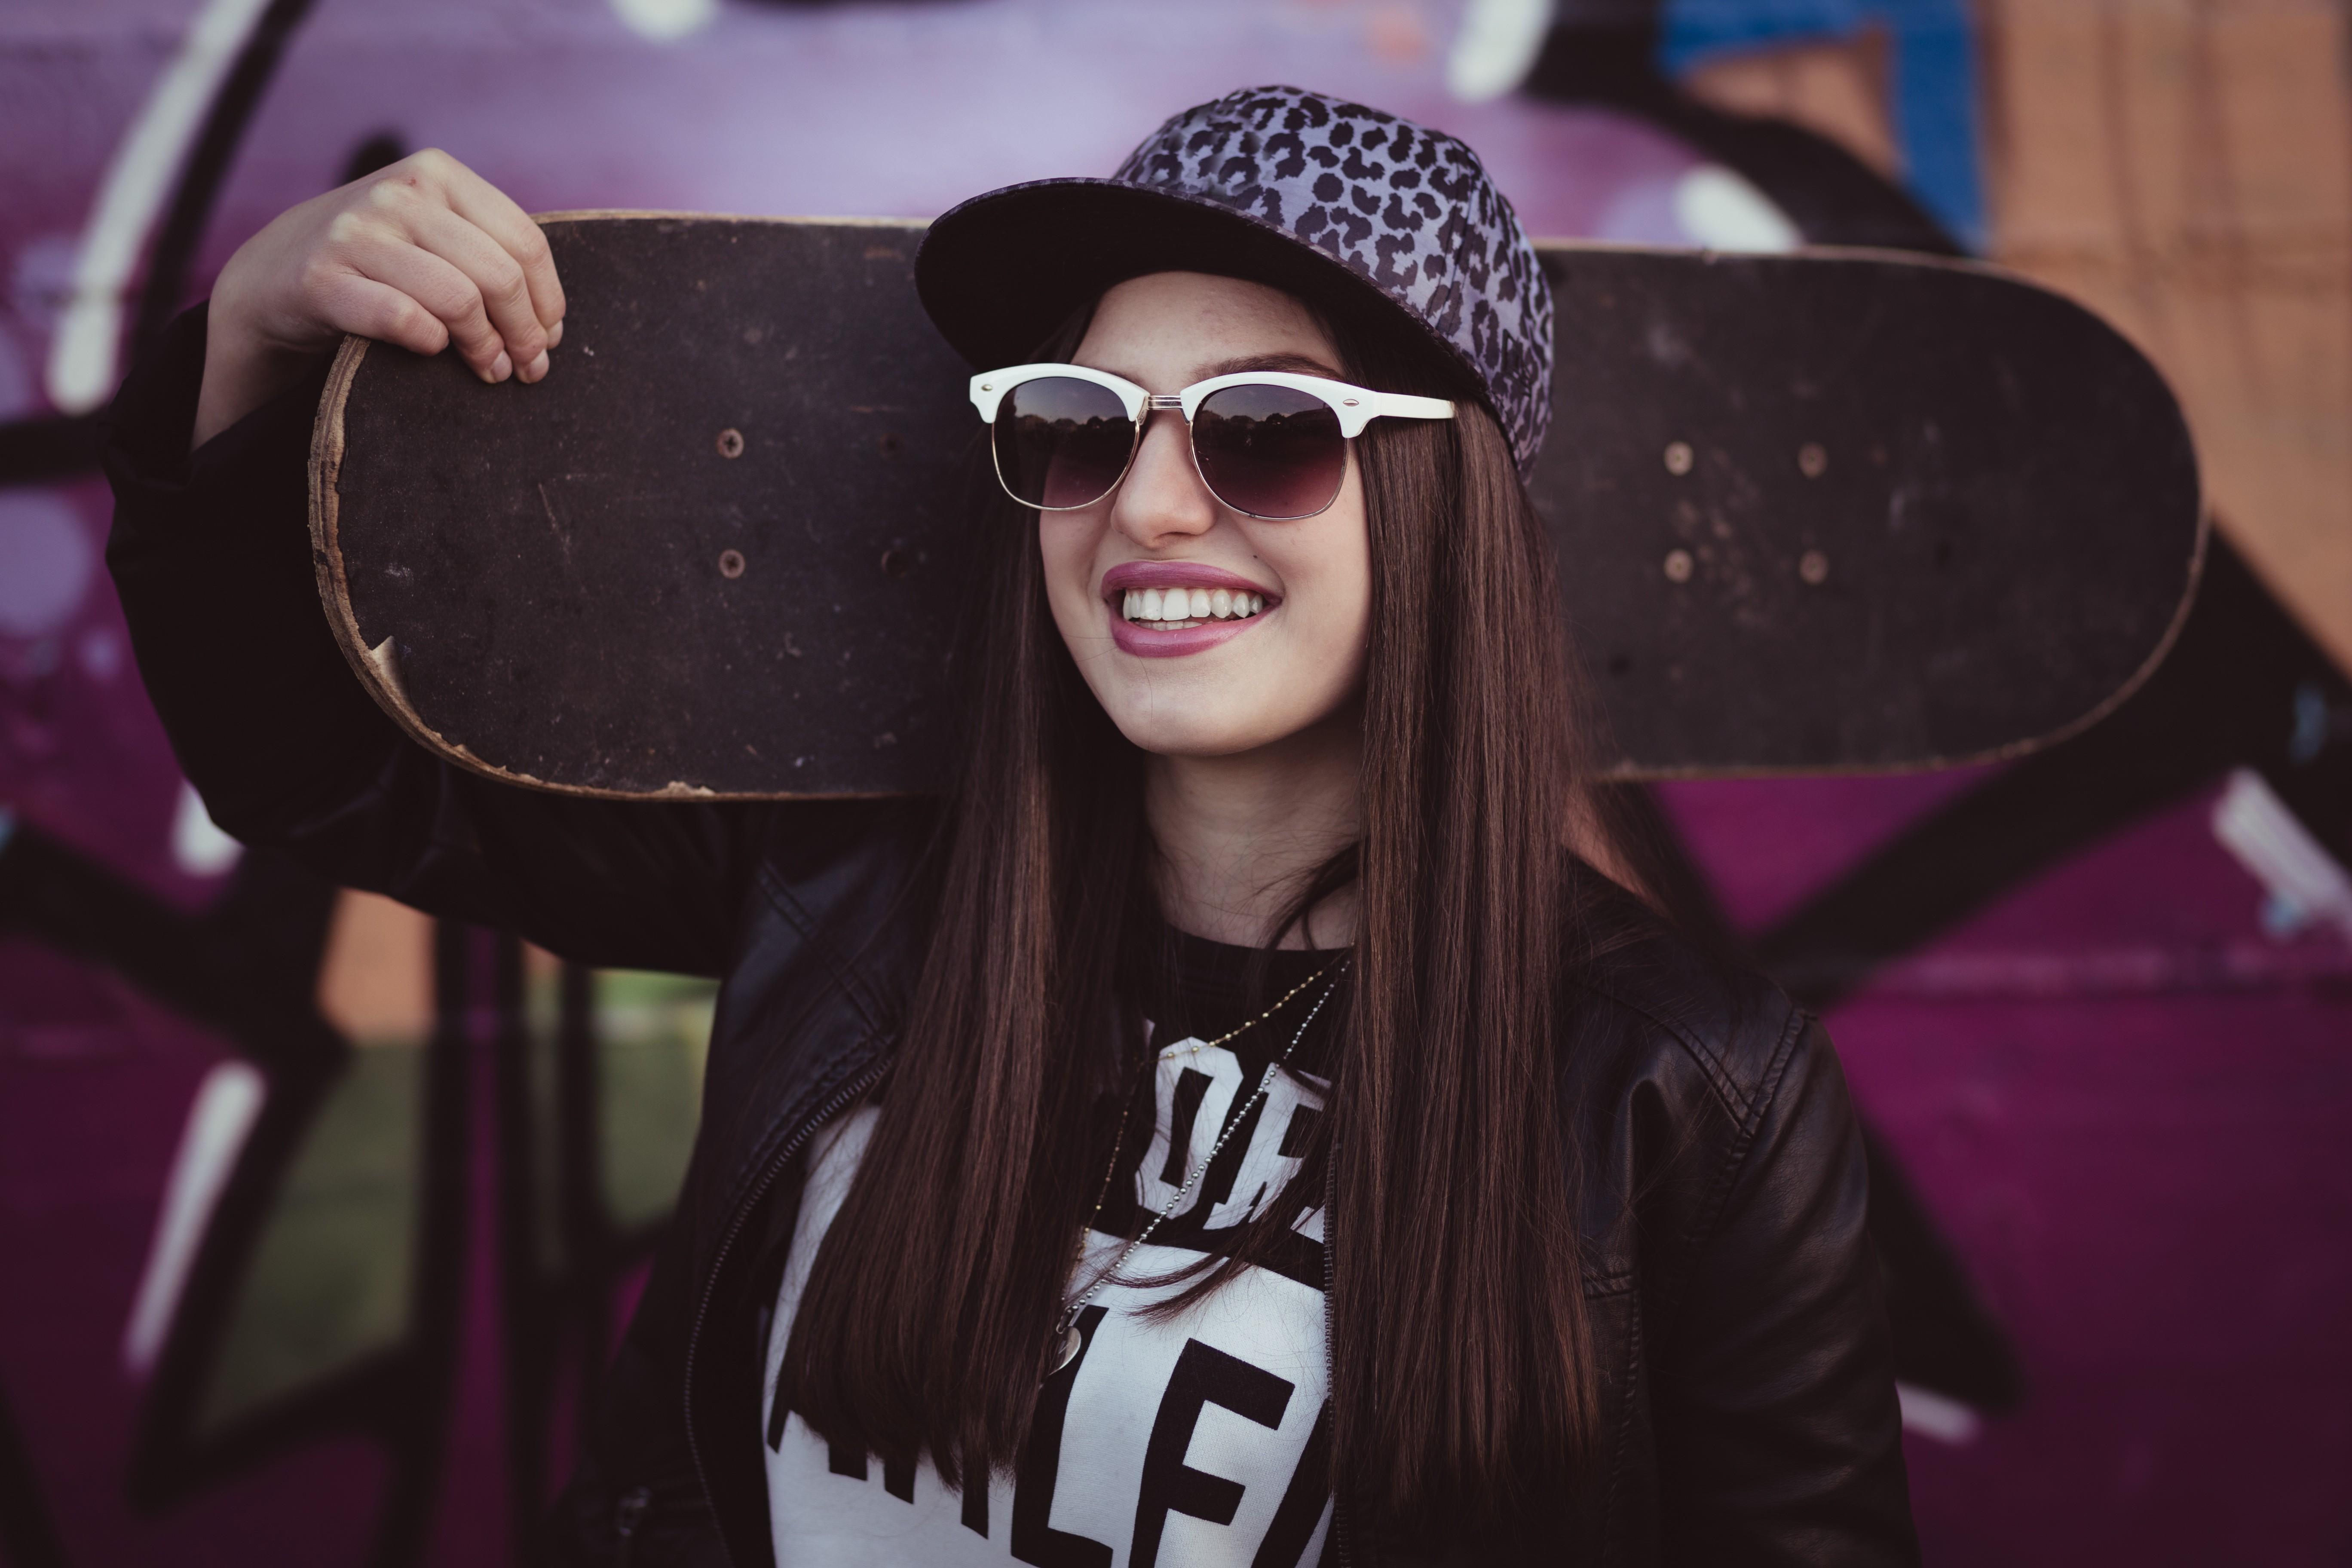 black women model sunglasses glasses smiling fashion skateboard clothing color girl beauty lady vision care eyewear